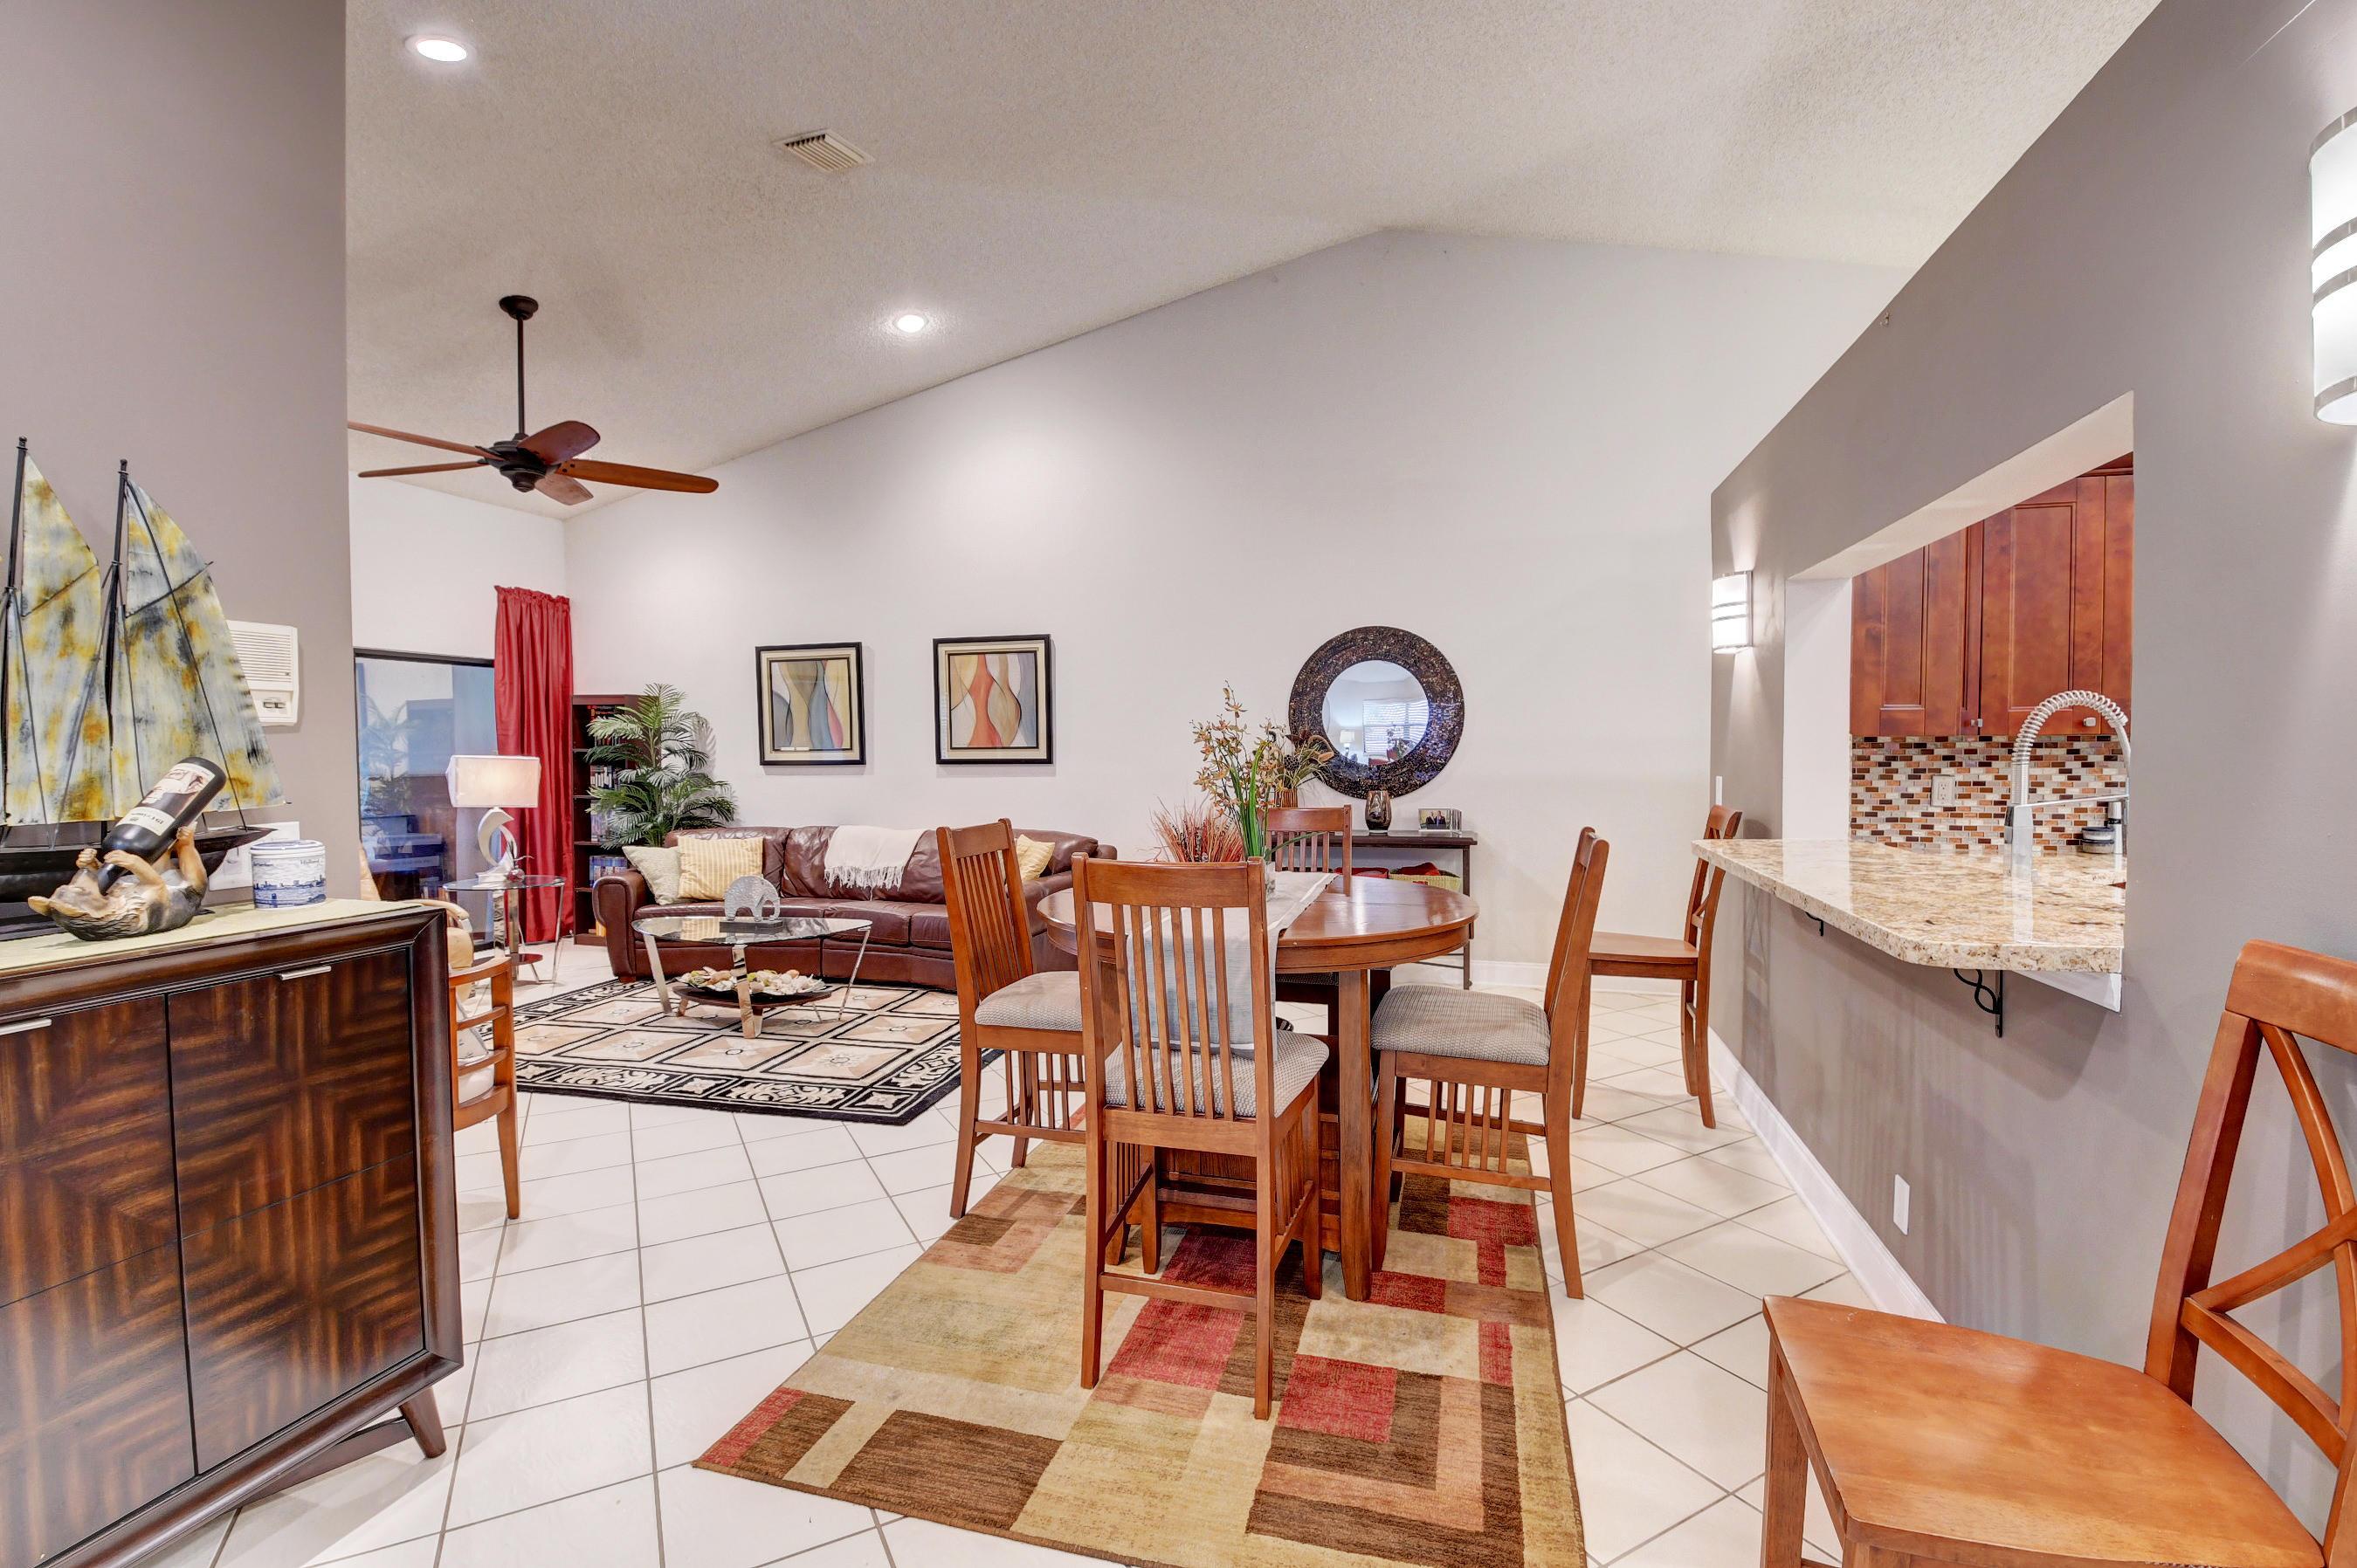 9628 Pavarotti Terrace 201 Boynton Beach, FL 33437 photo 21